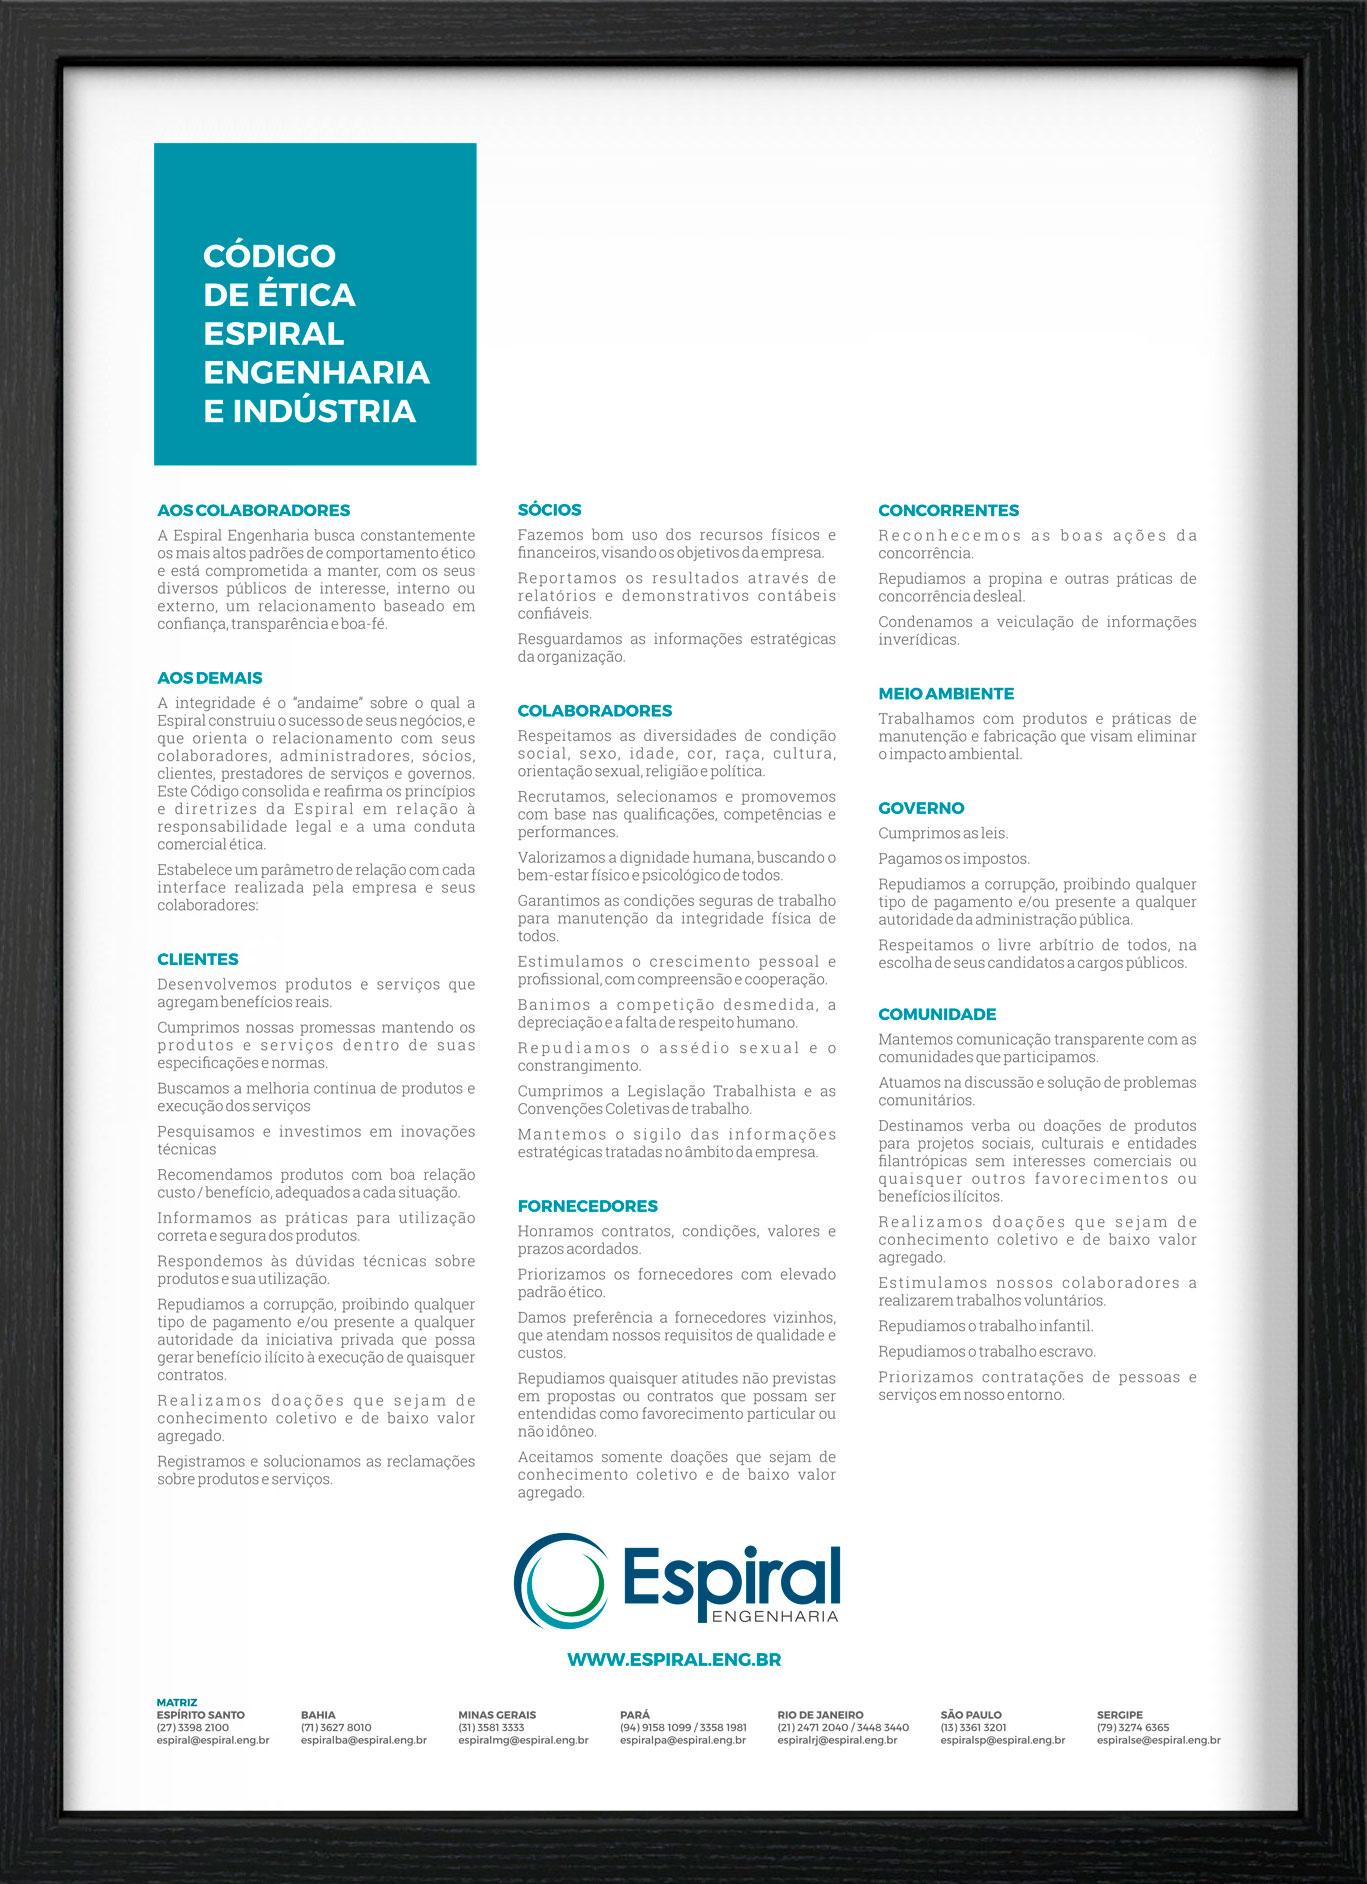 Código de Ética Espiral Engenharia